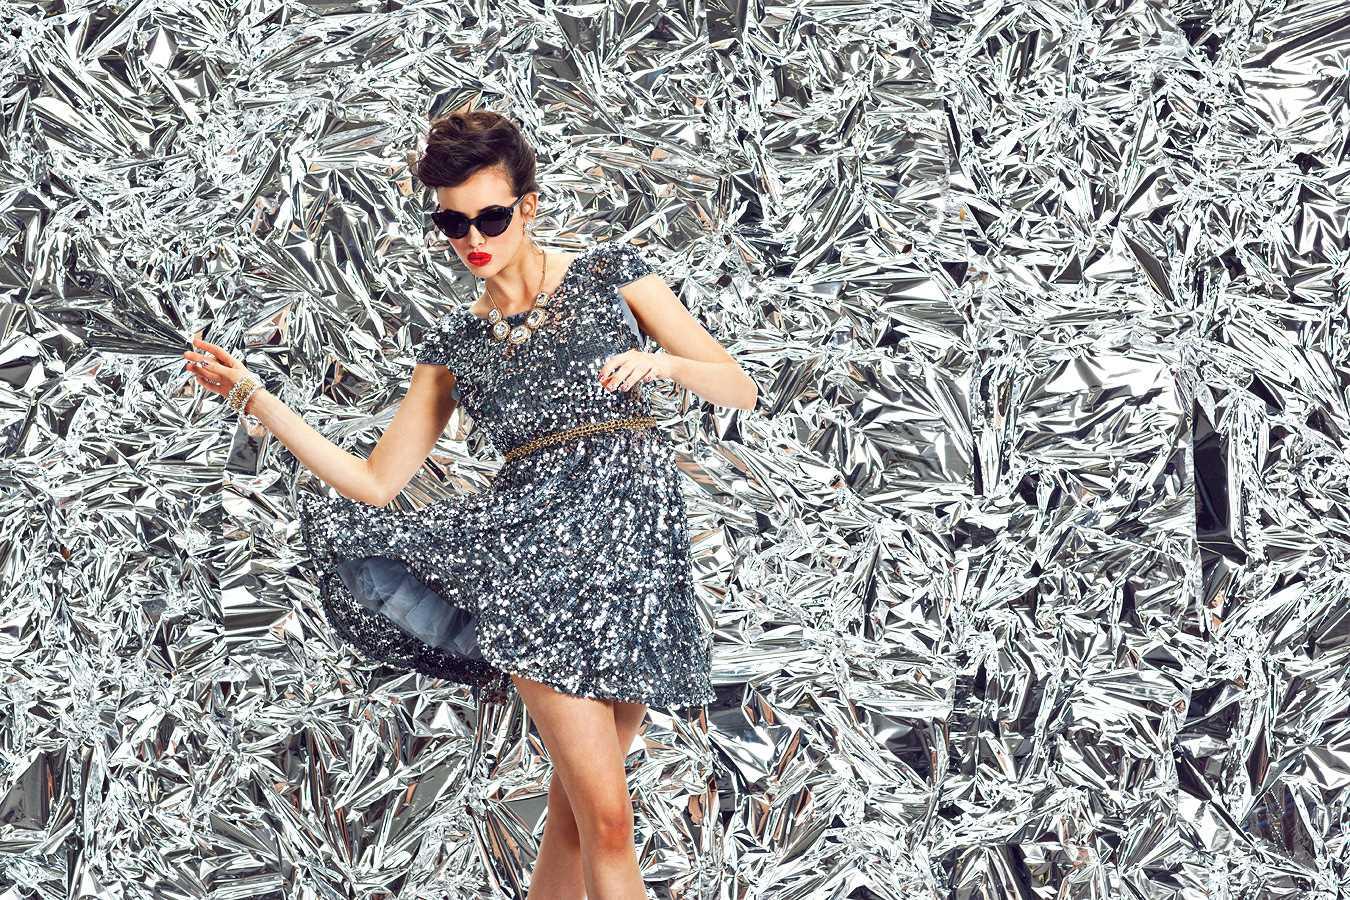 Fashion Photography by Julia Galdo and Cody Cloud